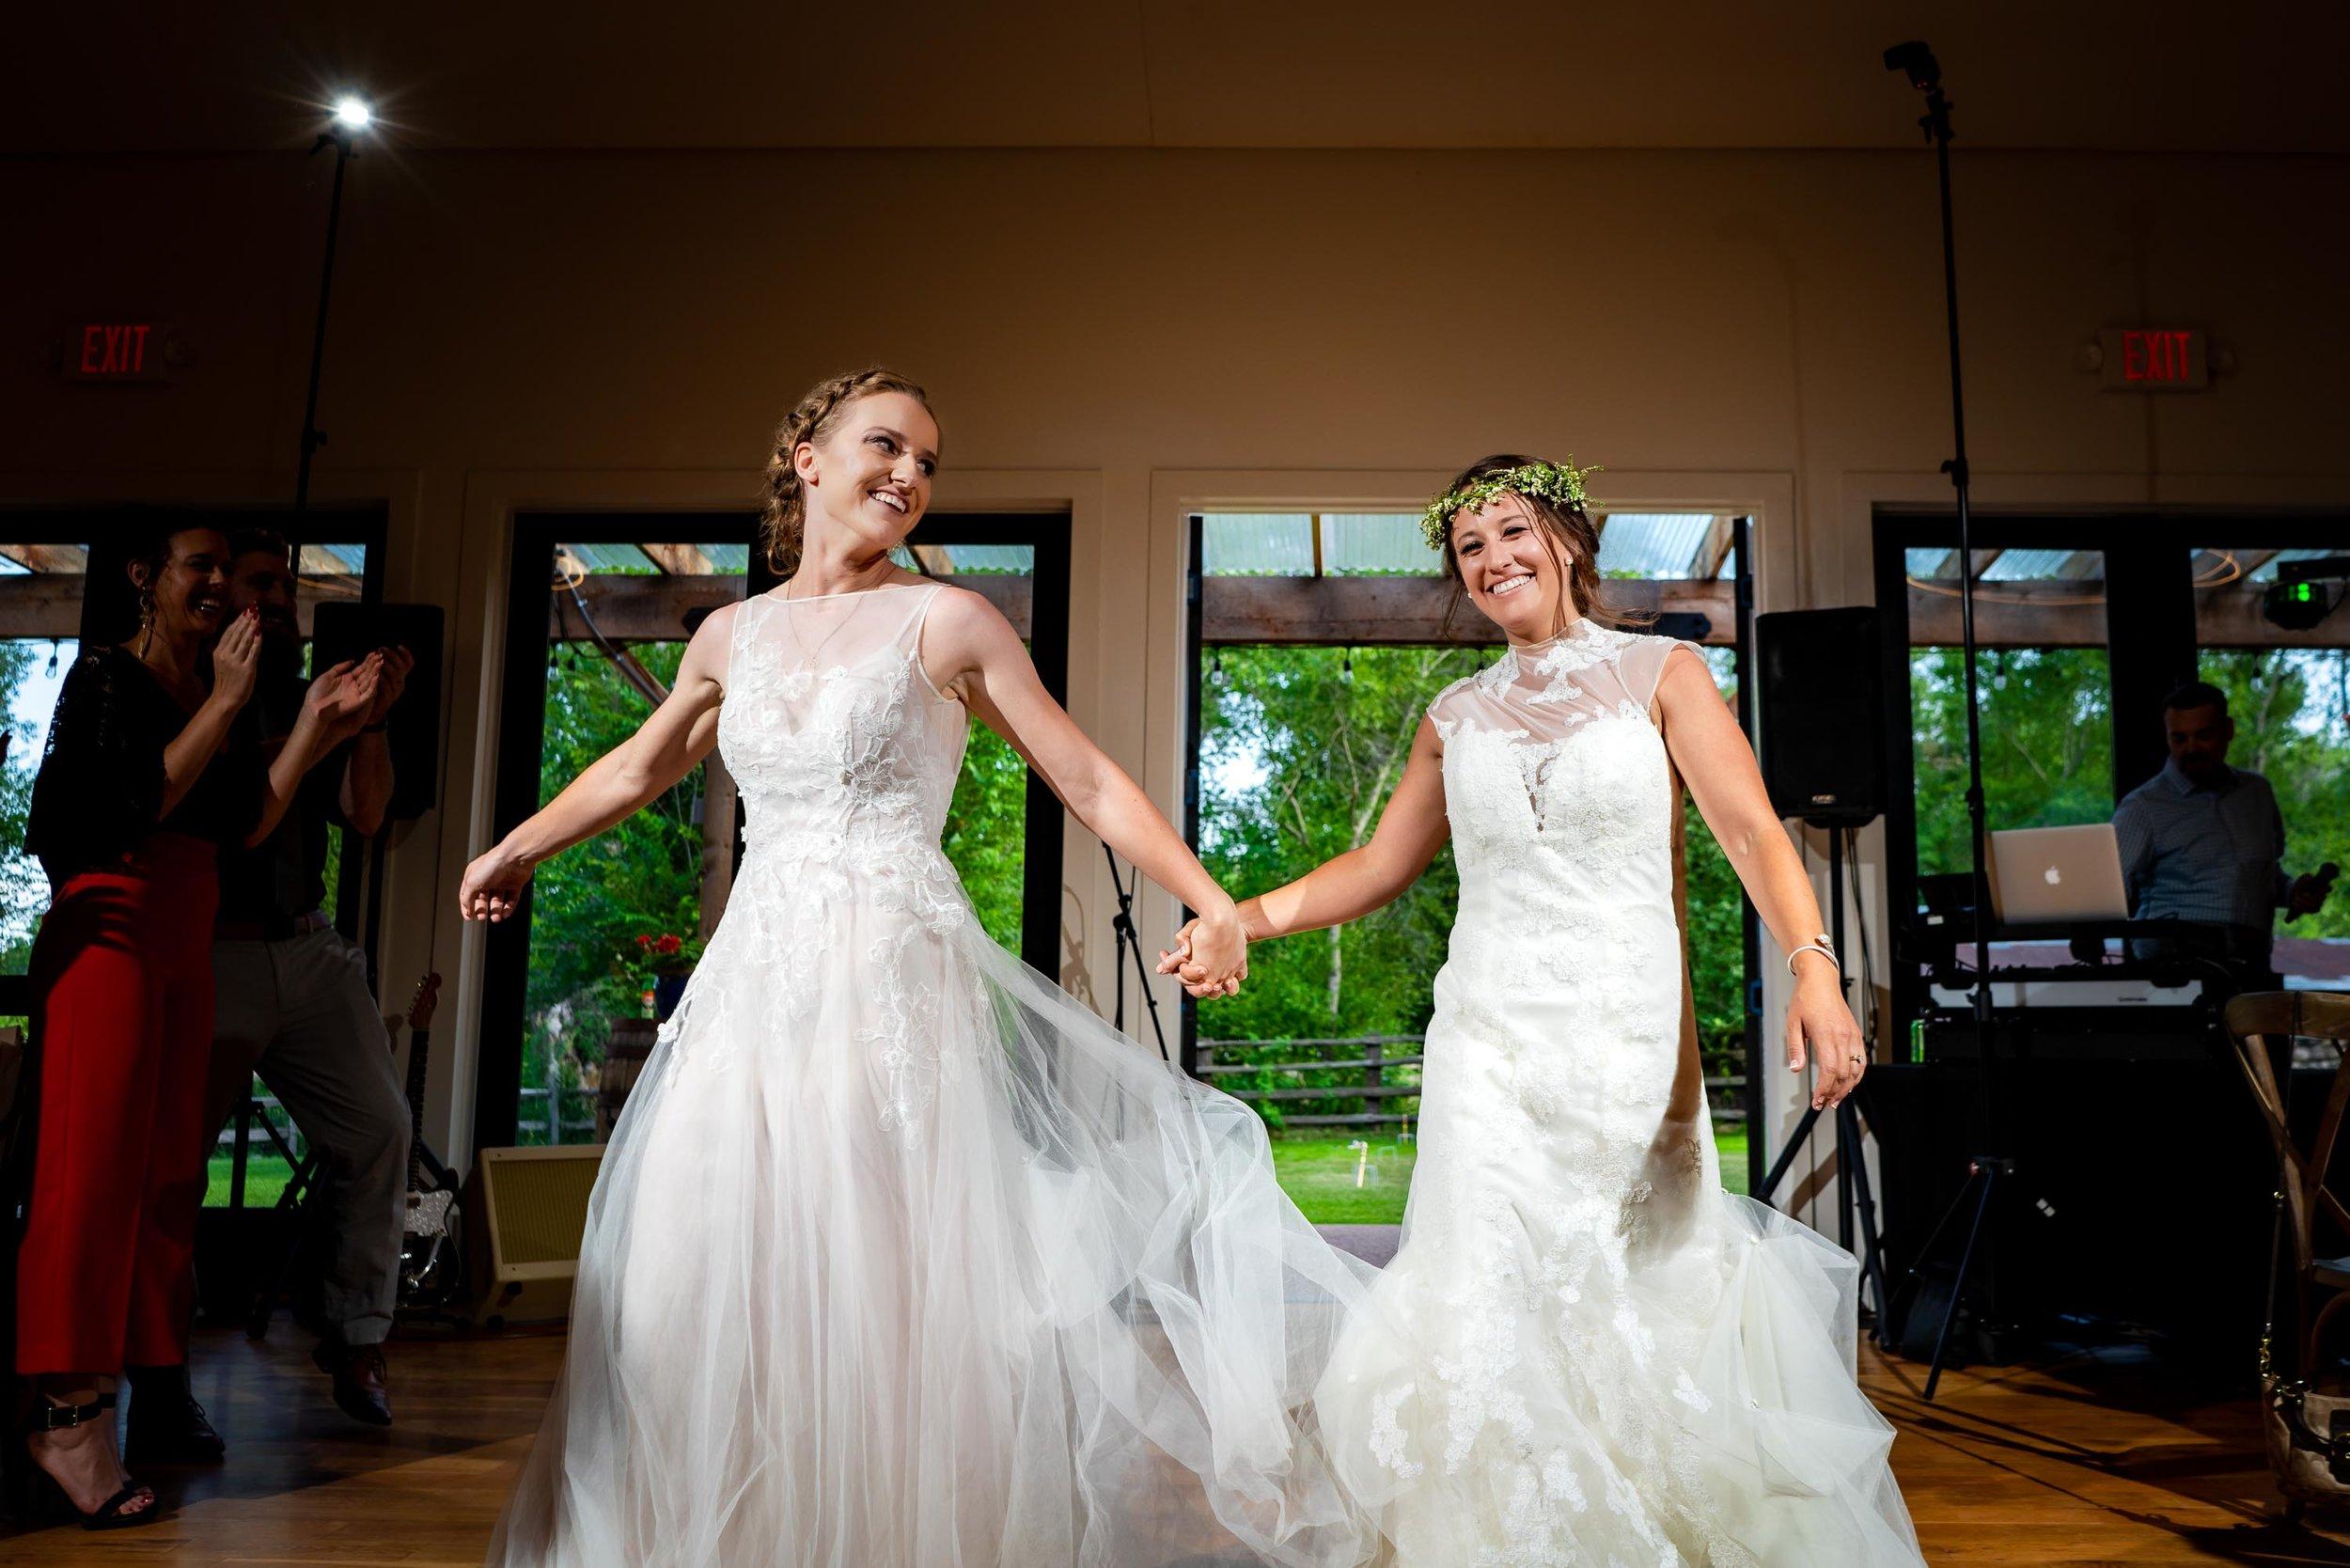 Rist_Canyon_Inn_Laporte_Wedding-152.jpg